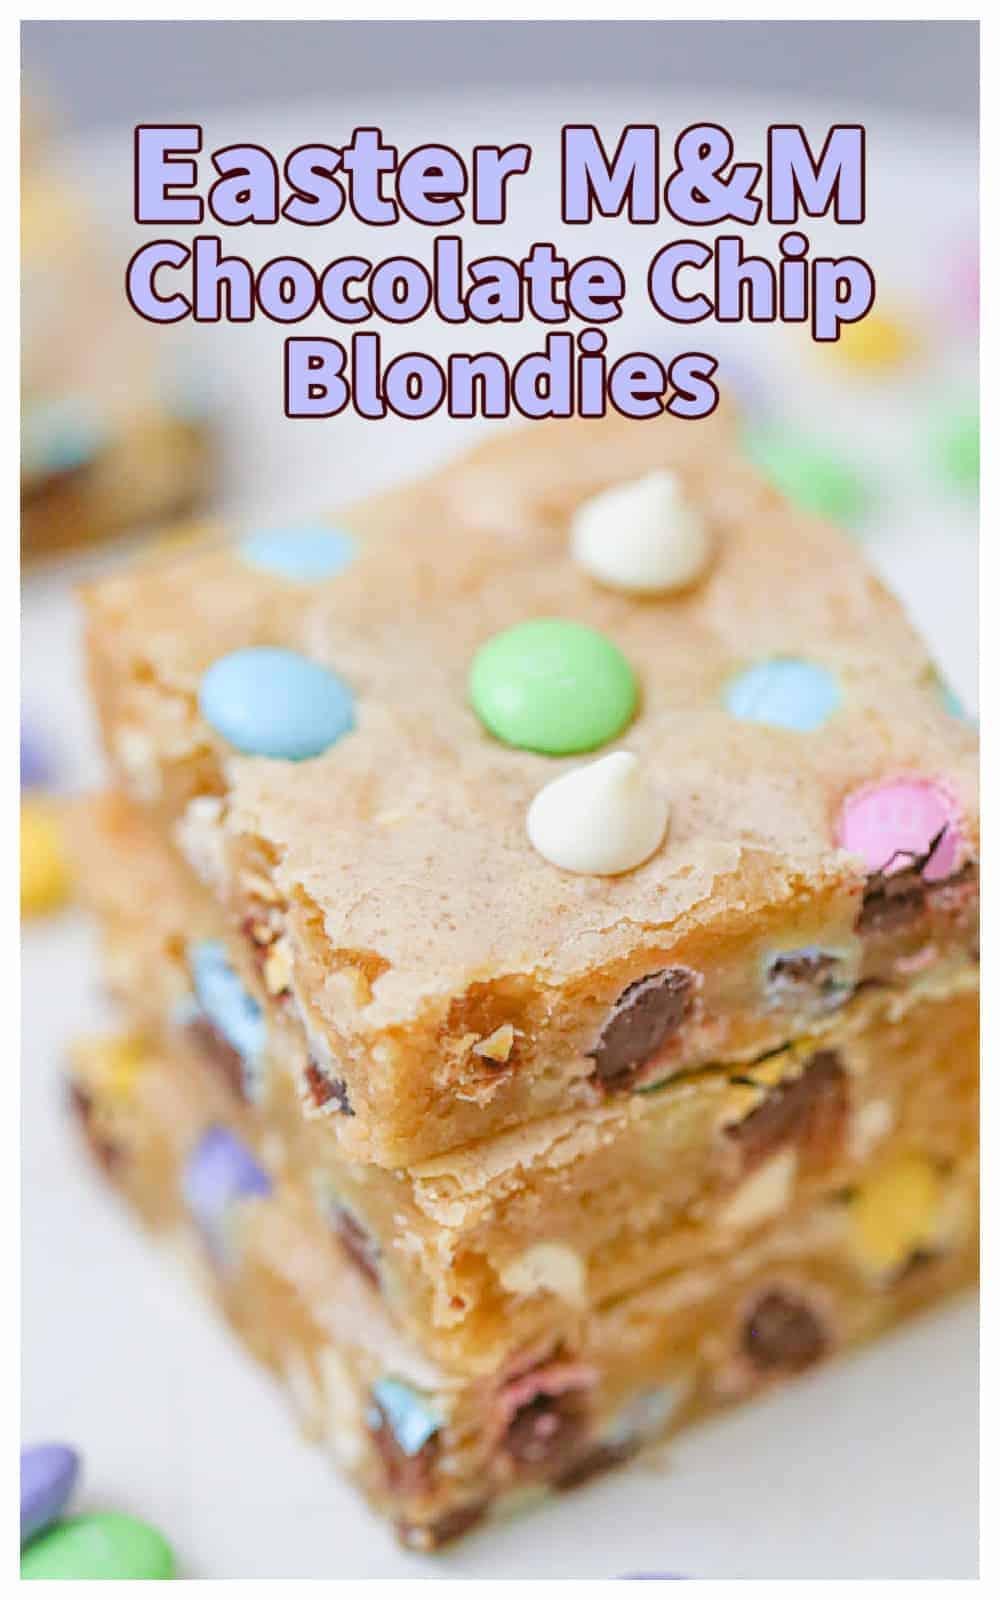 Easter M&M Chocolate Chip Blondies